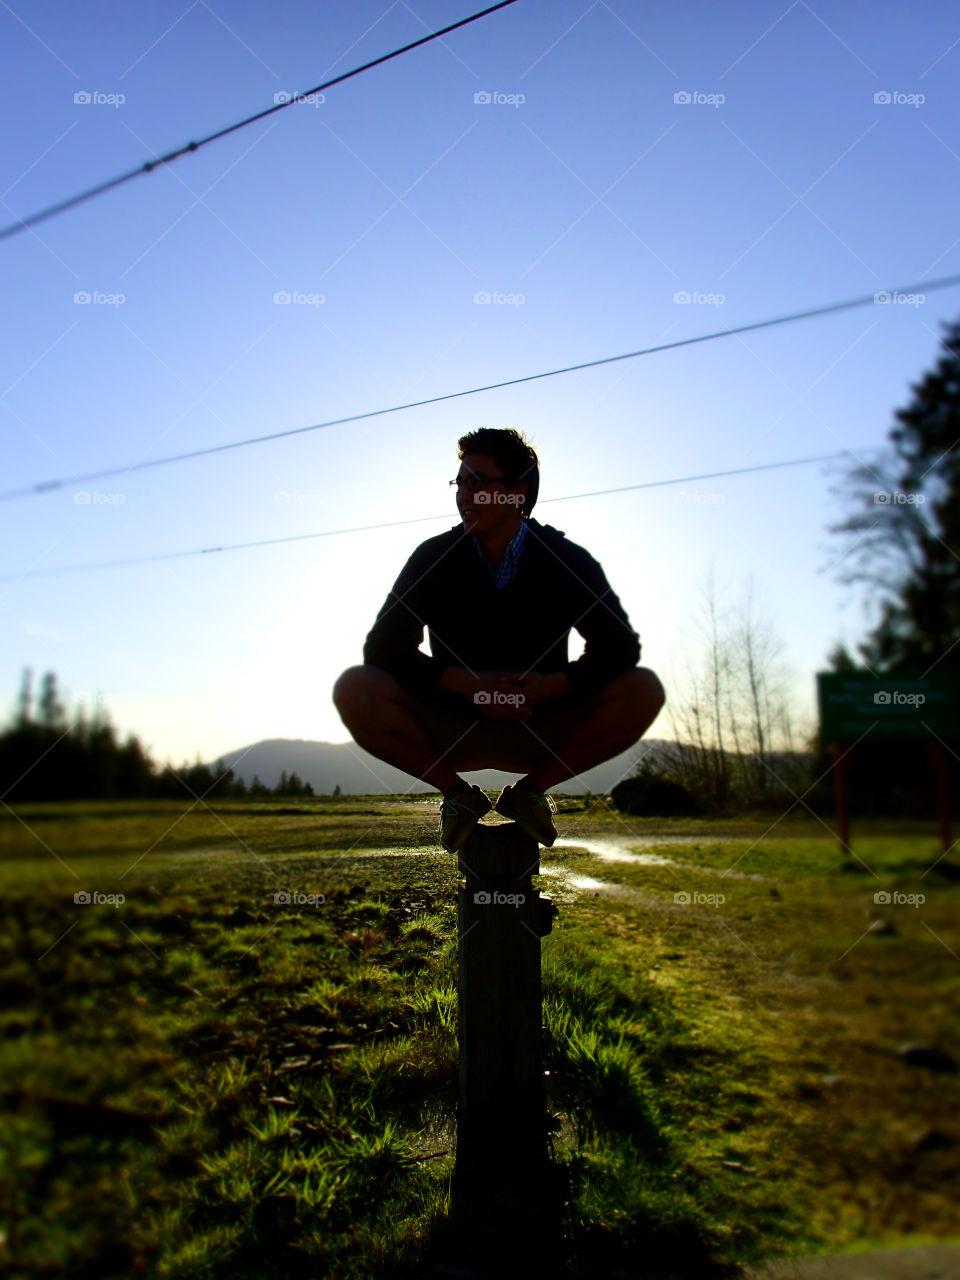 Squatting on a post